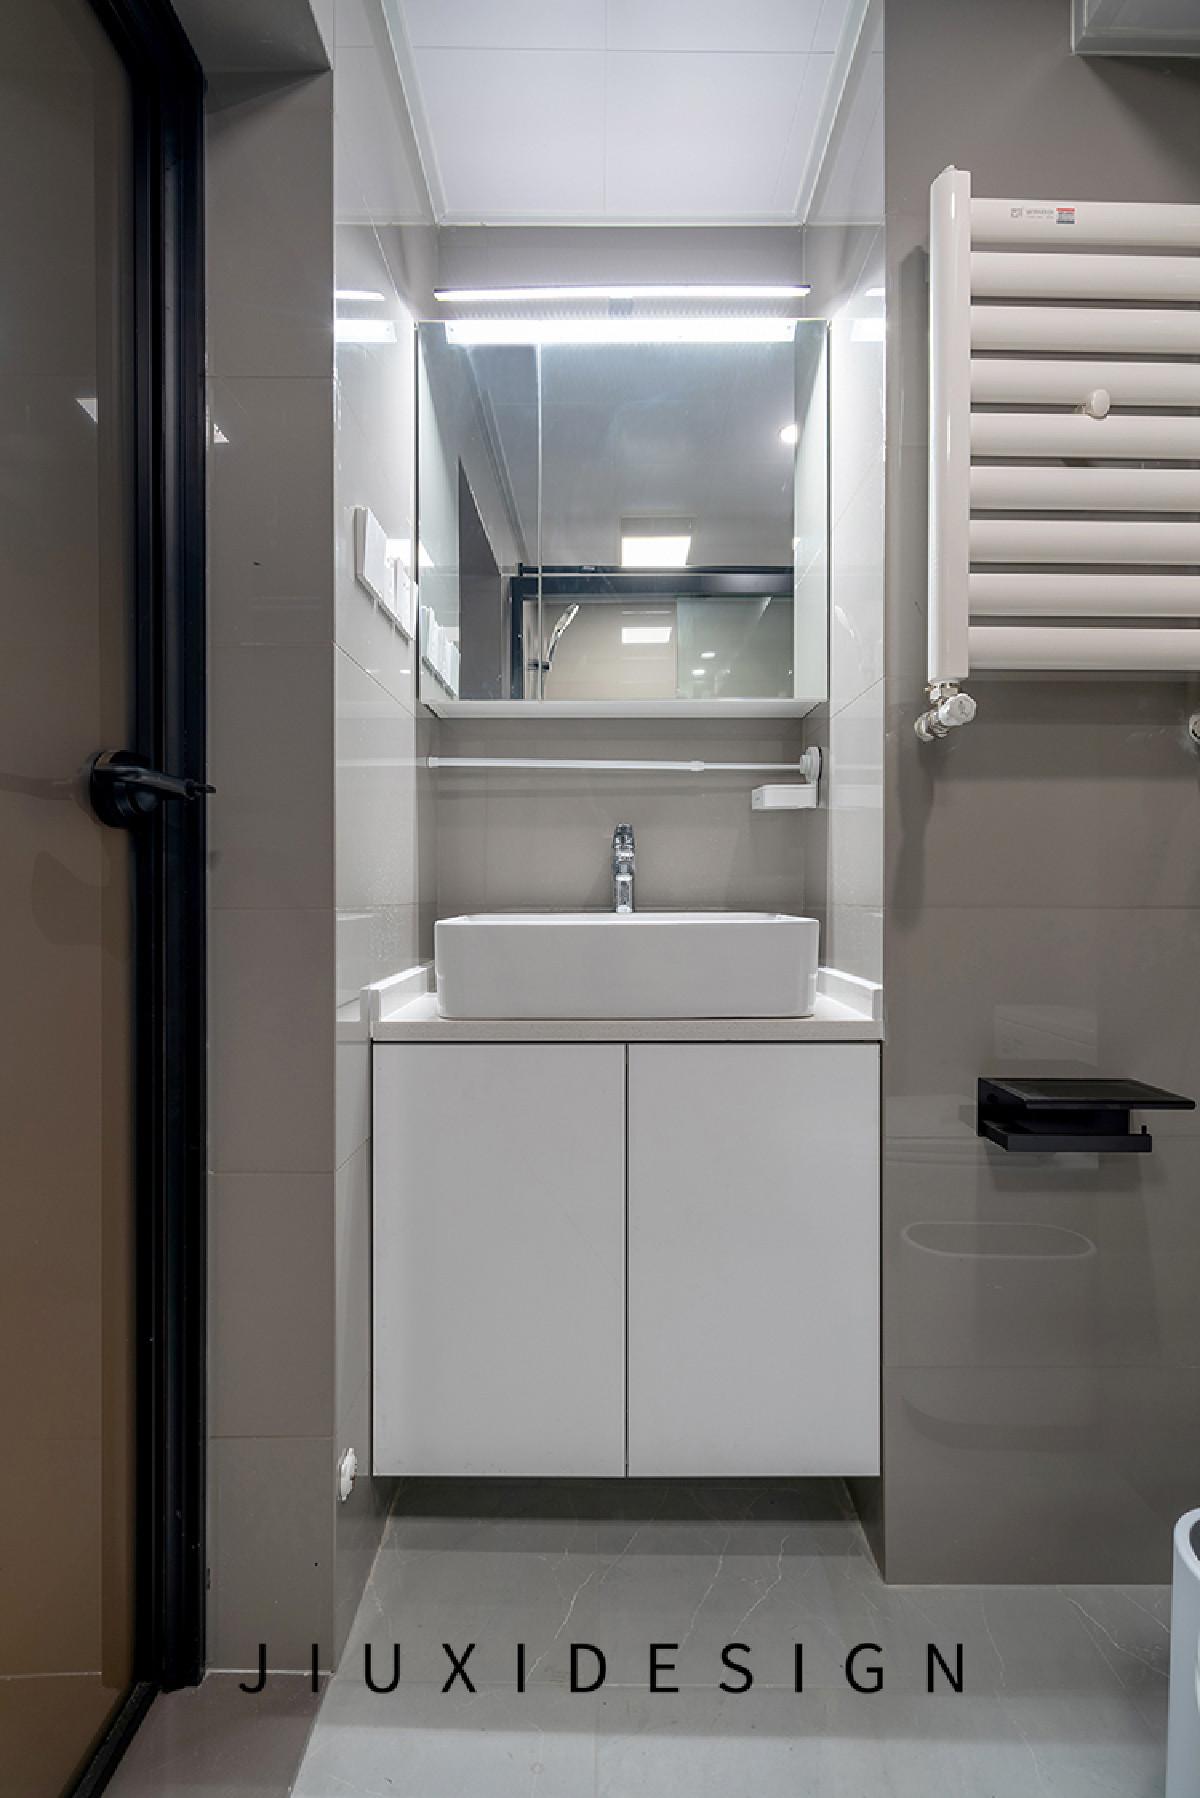 "800mm宽度的洗手台嵌入管道与墙体之间的""缝隙""中,小小的镜柜中能放置许多日常使用的化妆品,下方的洗手柜也能堆放很多杂物,明亮的镜前灯满足了照明需求。"